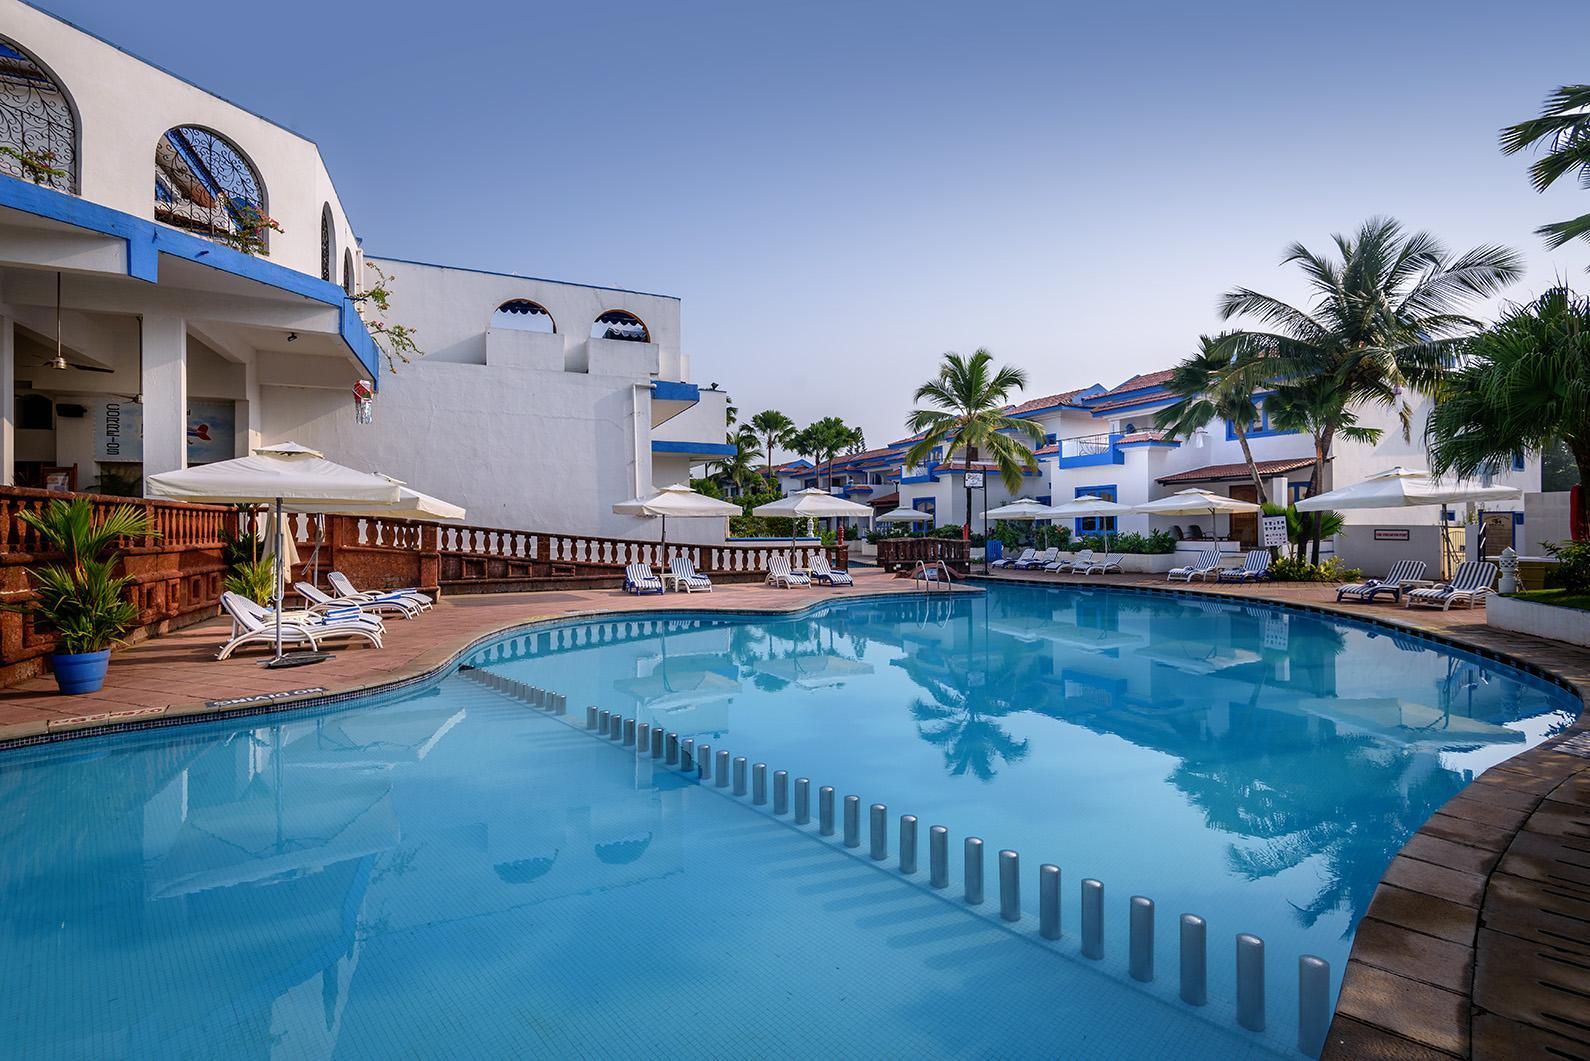 Karma Royal Haathi Mahal Resort